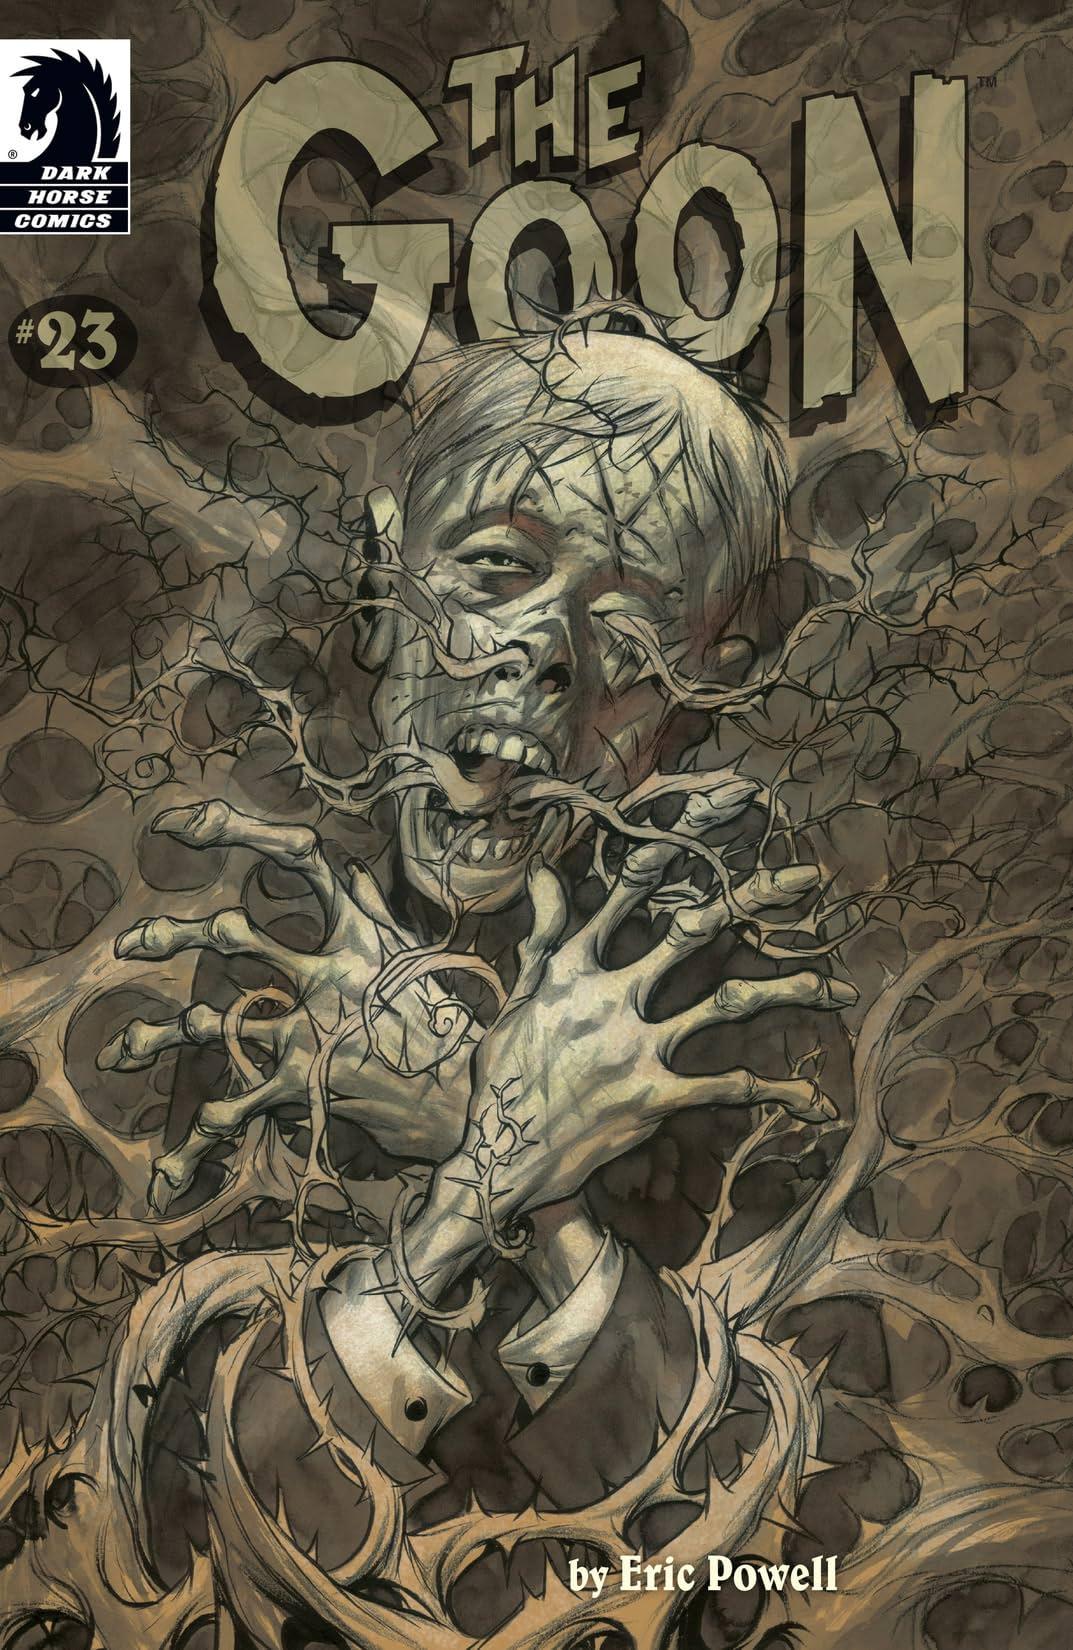 The Goon #23